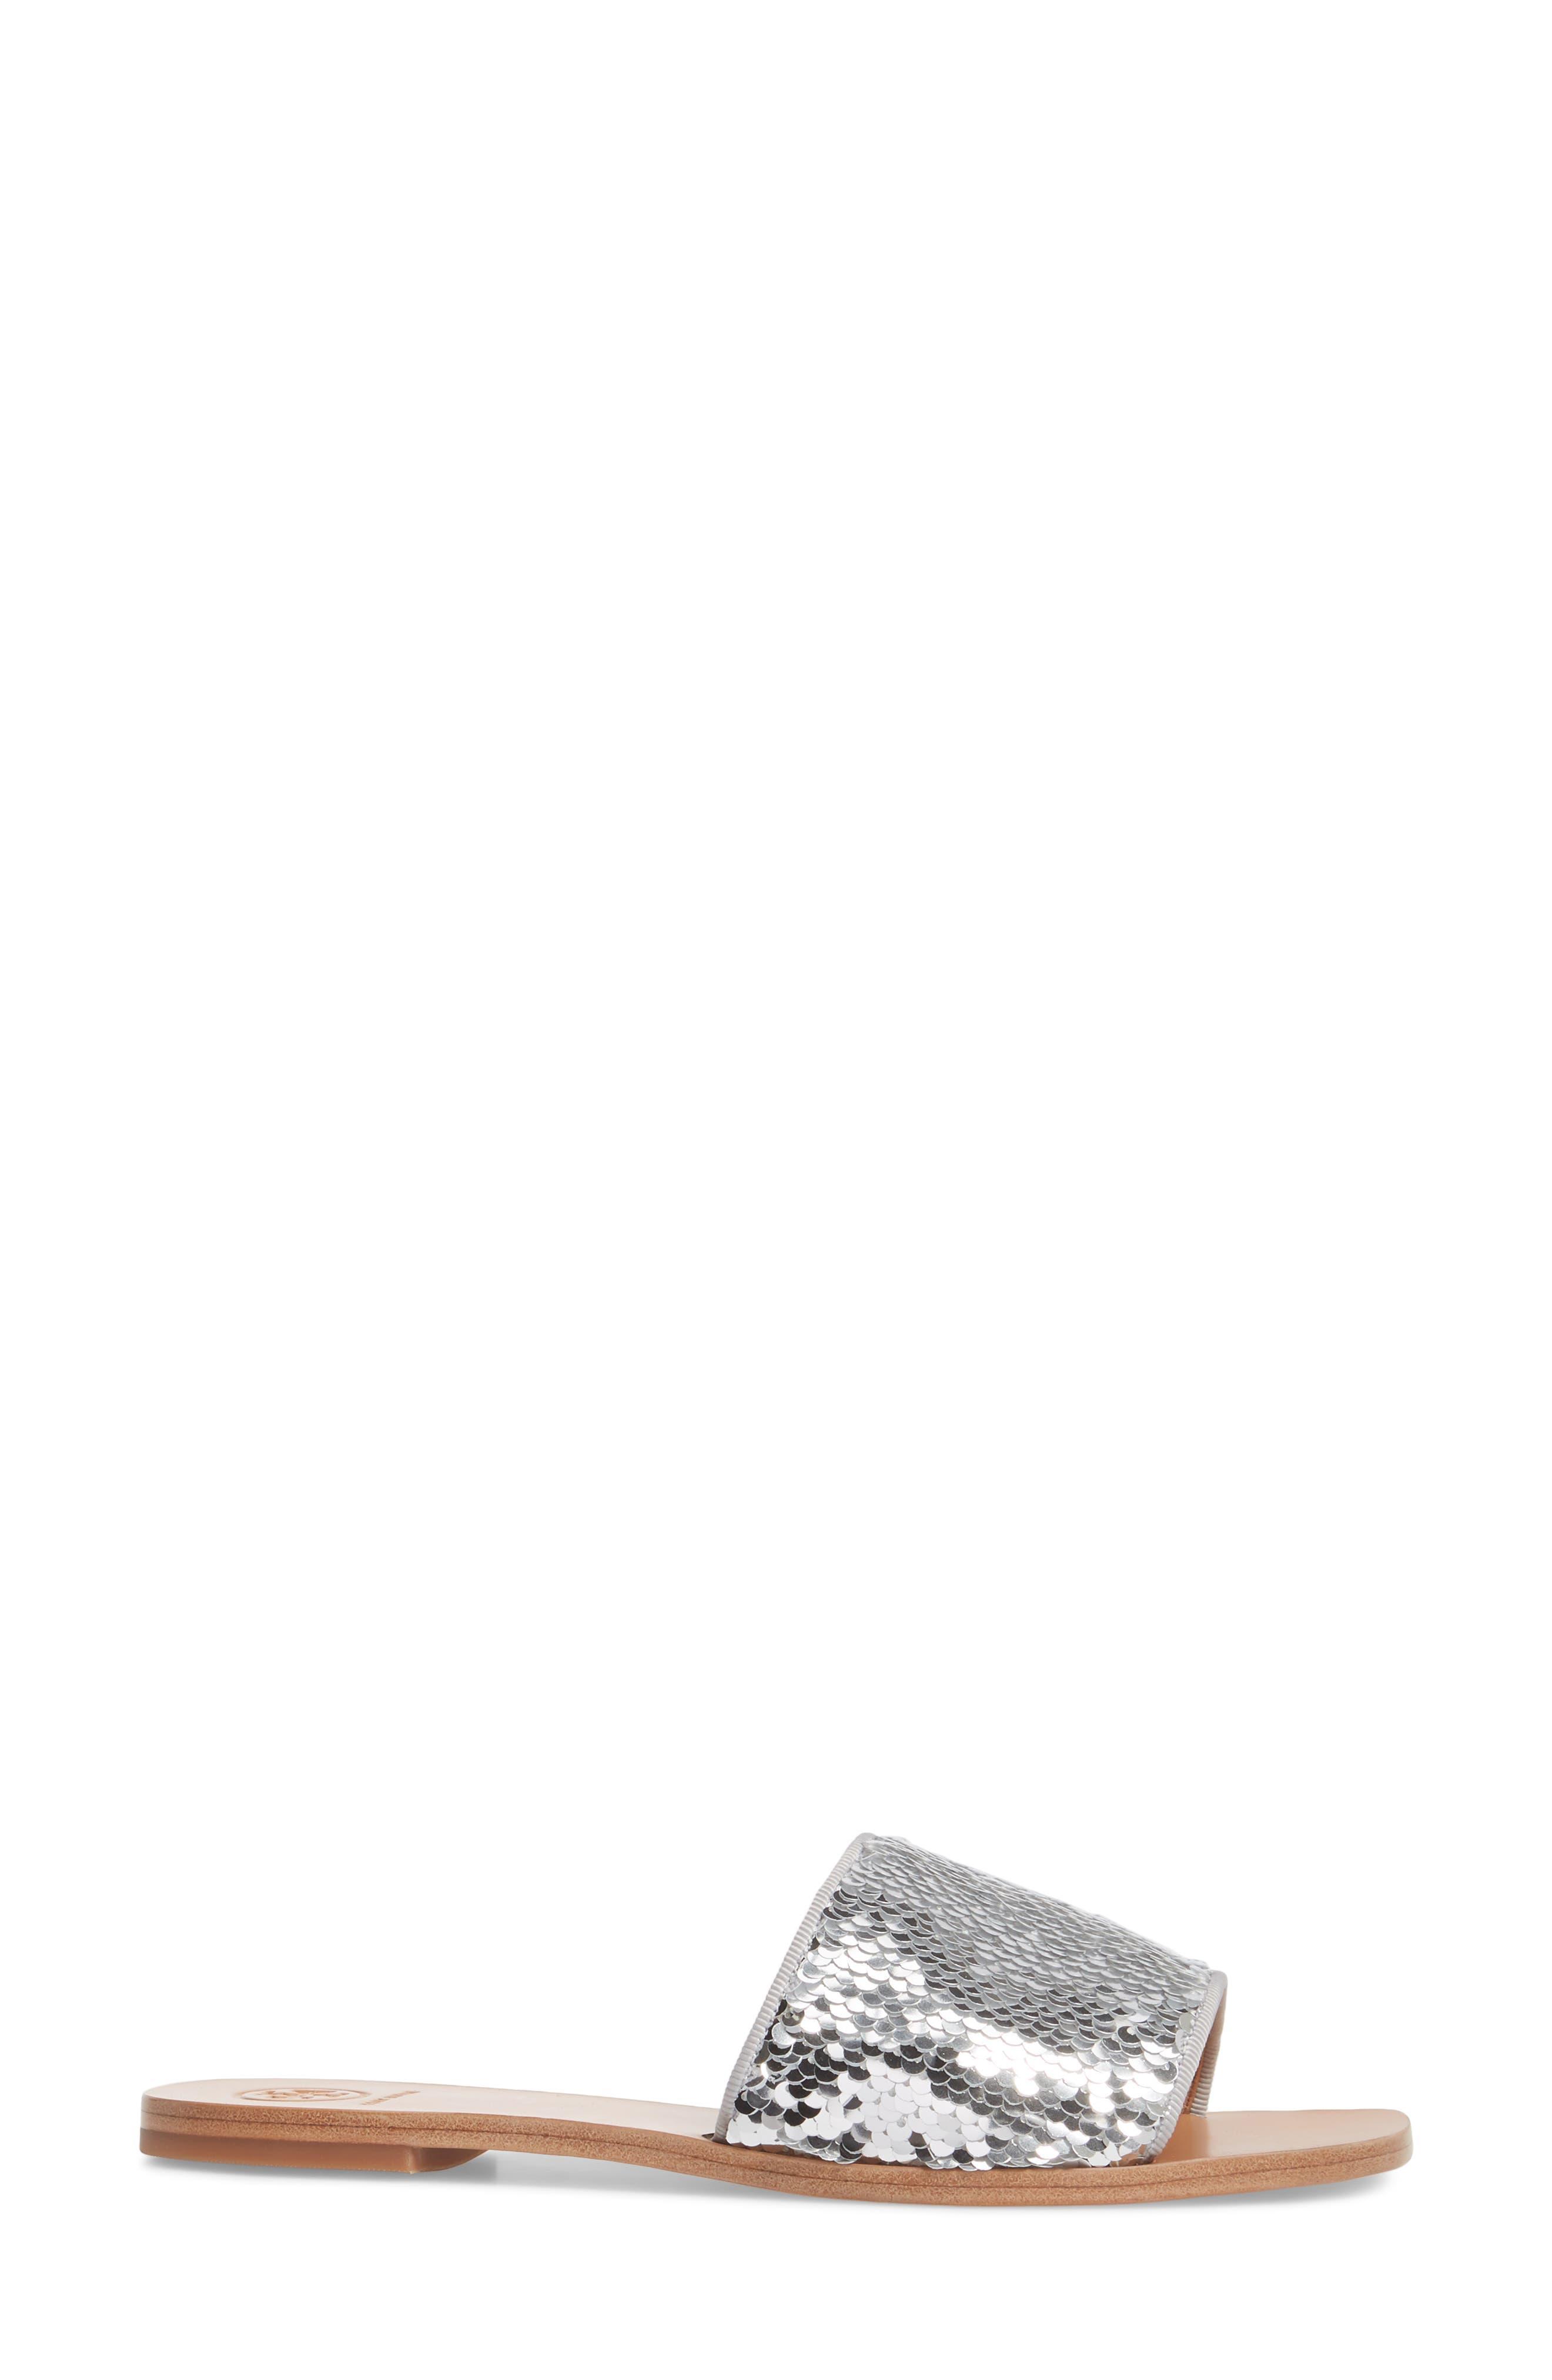 Carter Sequin Slide Sandal,                             Alternate thumbnail 3, color,                             Silver/ Perfect White